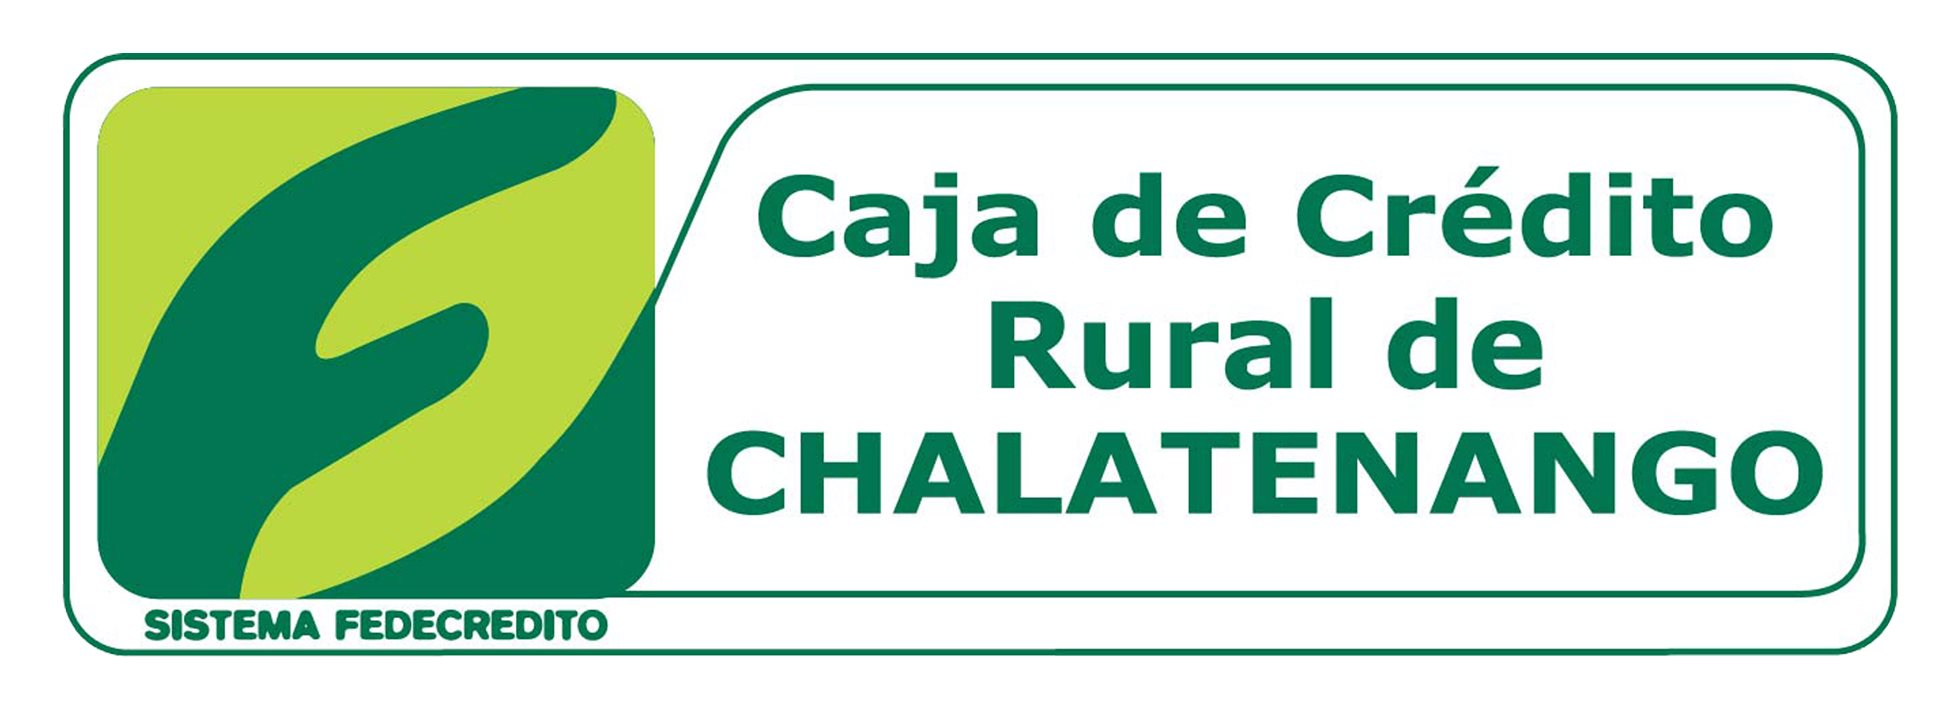 Caja de Credito Rural de Chalatenango